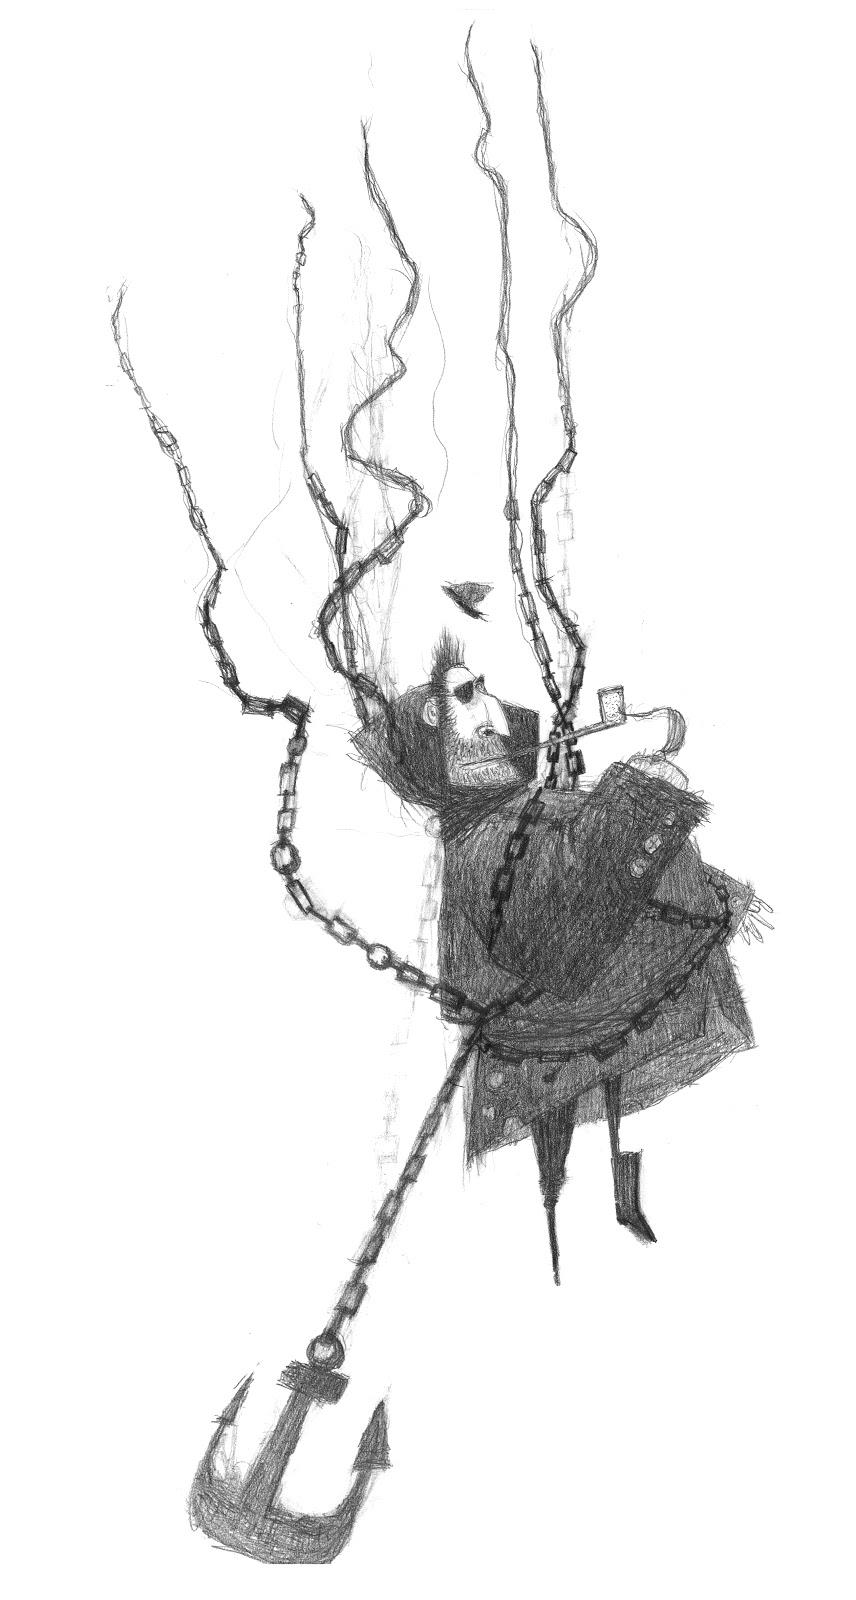 094j-paranorman-concept-art-character-design-sailor_ghost_1.jpg